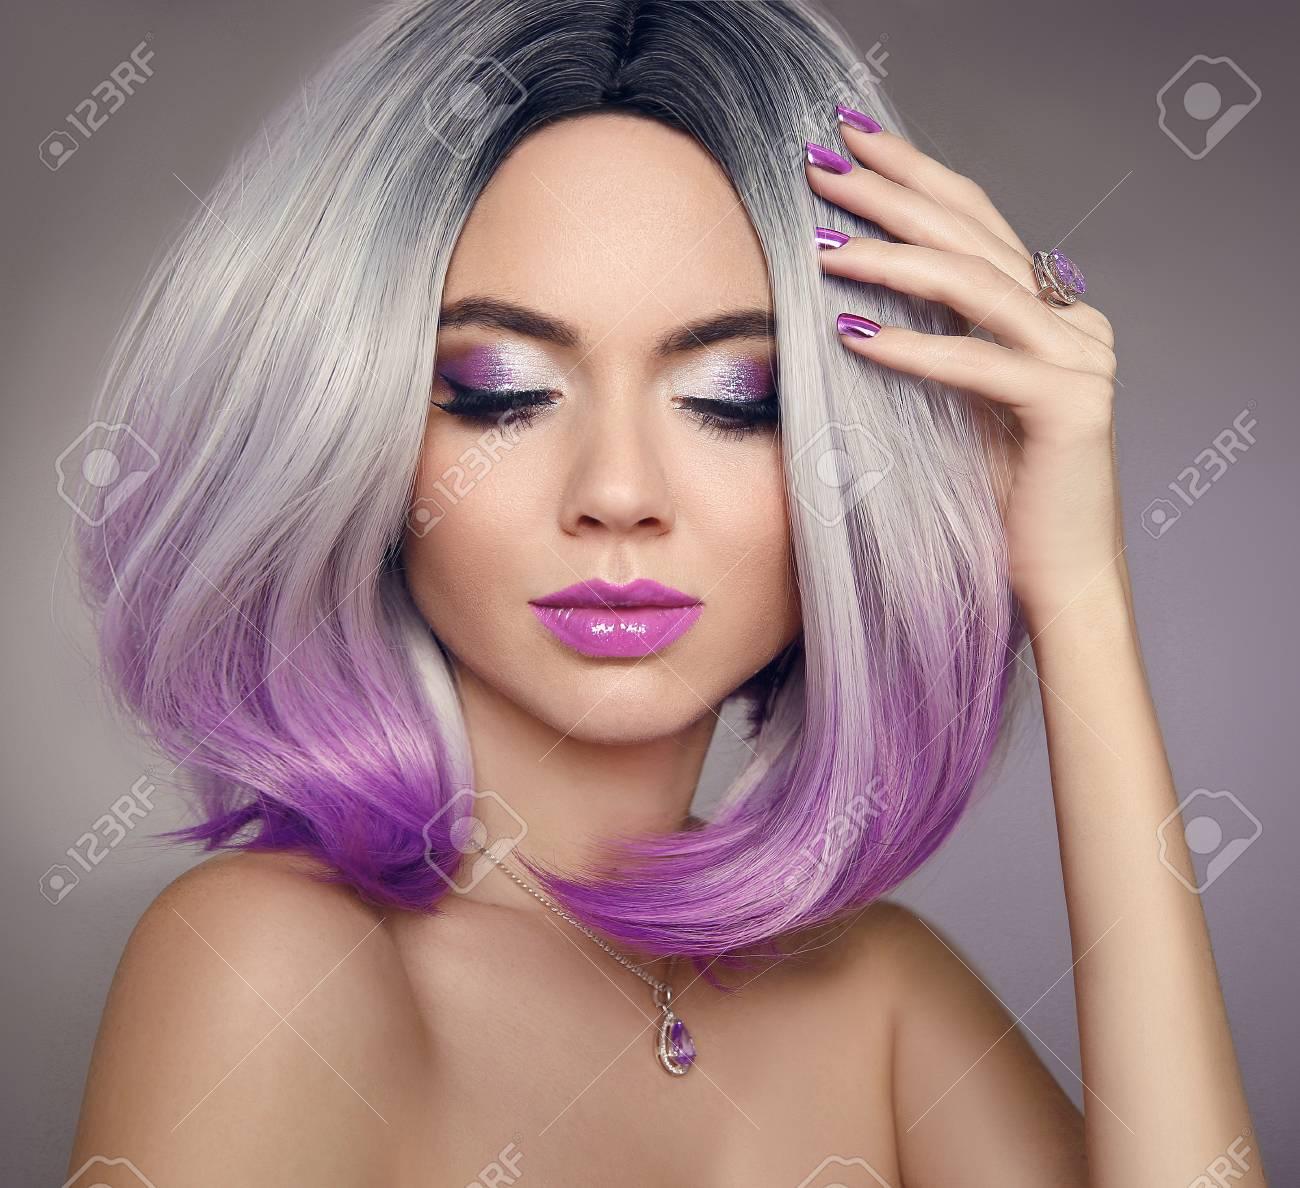 Ombre Bob Hair Coloring Woman Beauty Portrait Of Blond Model